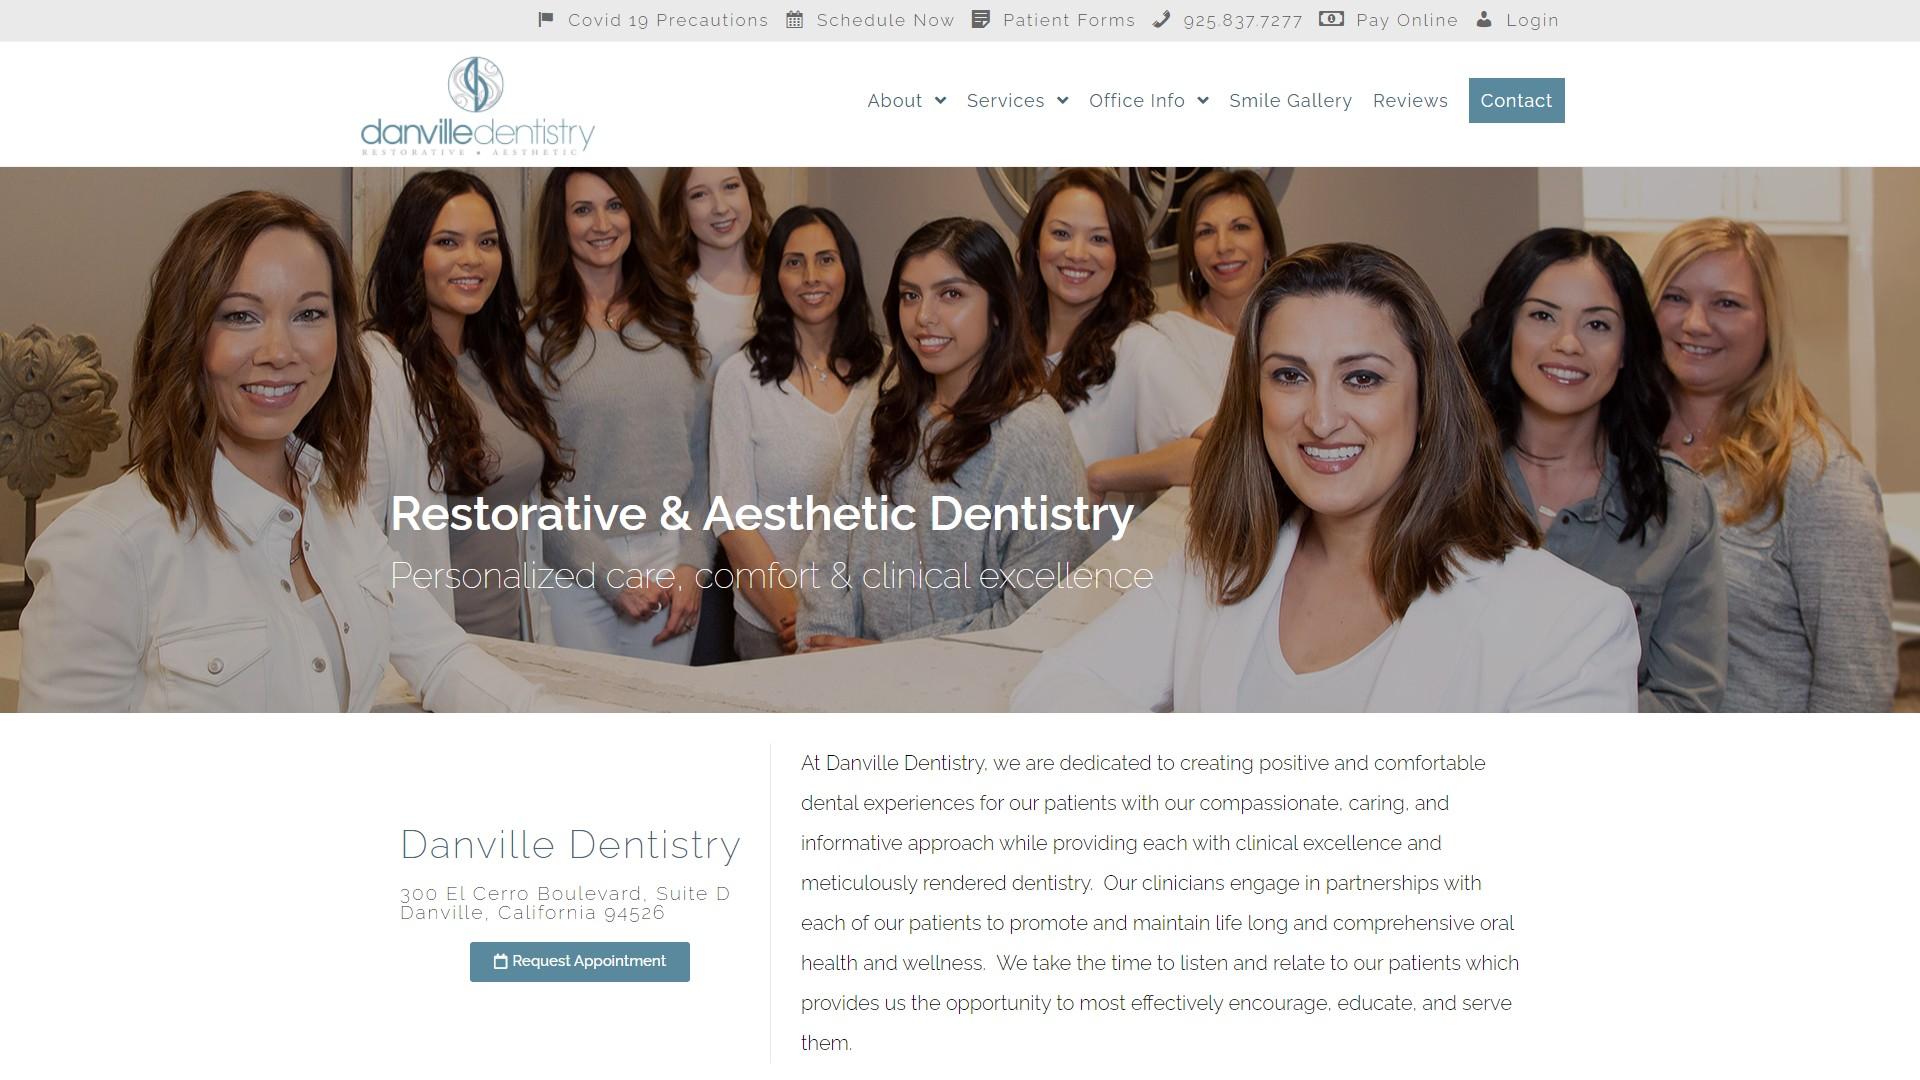 danvilledentistry